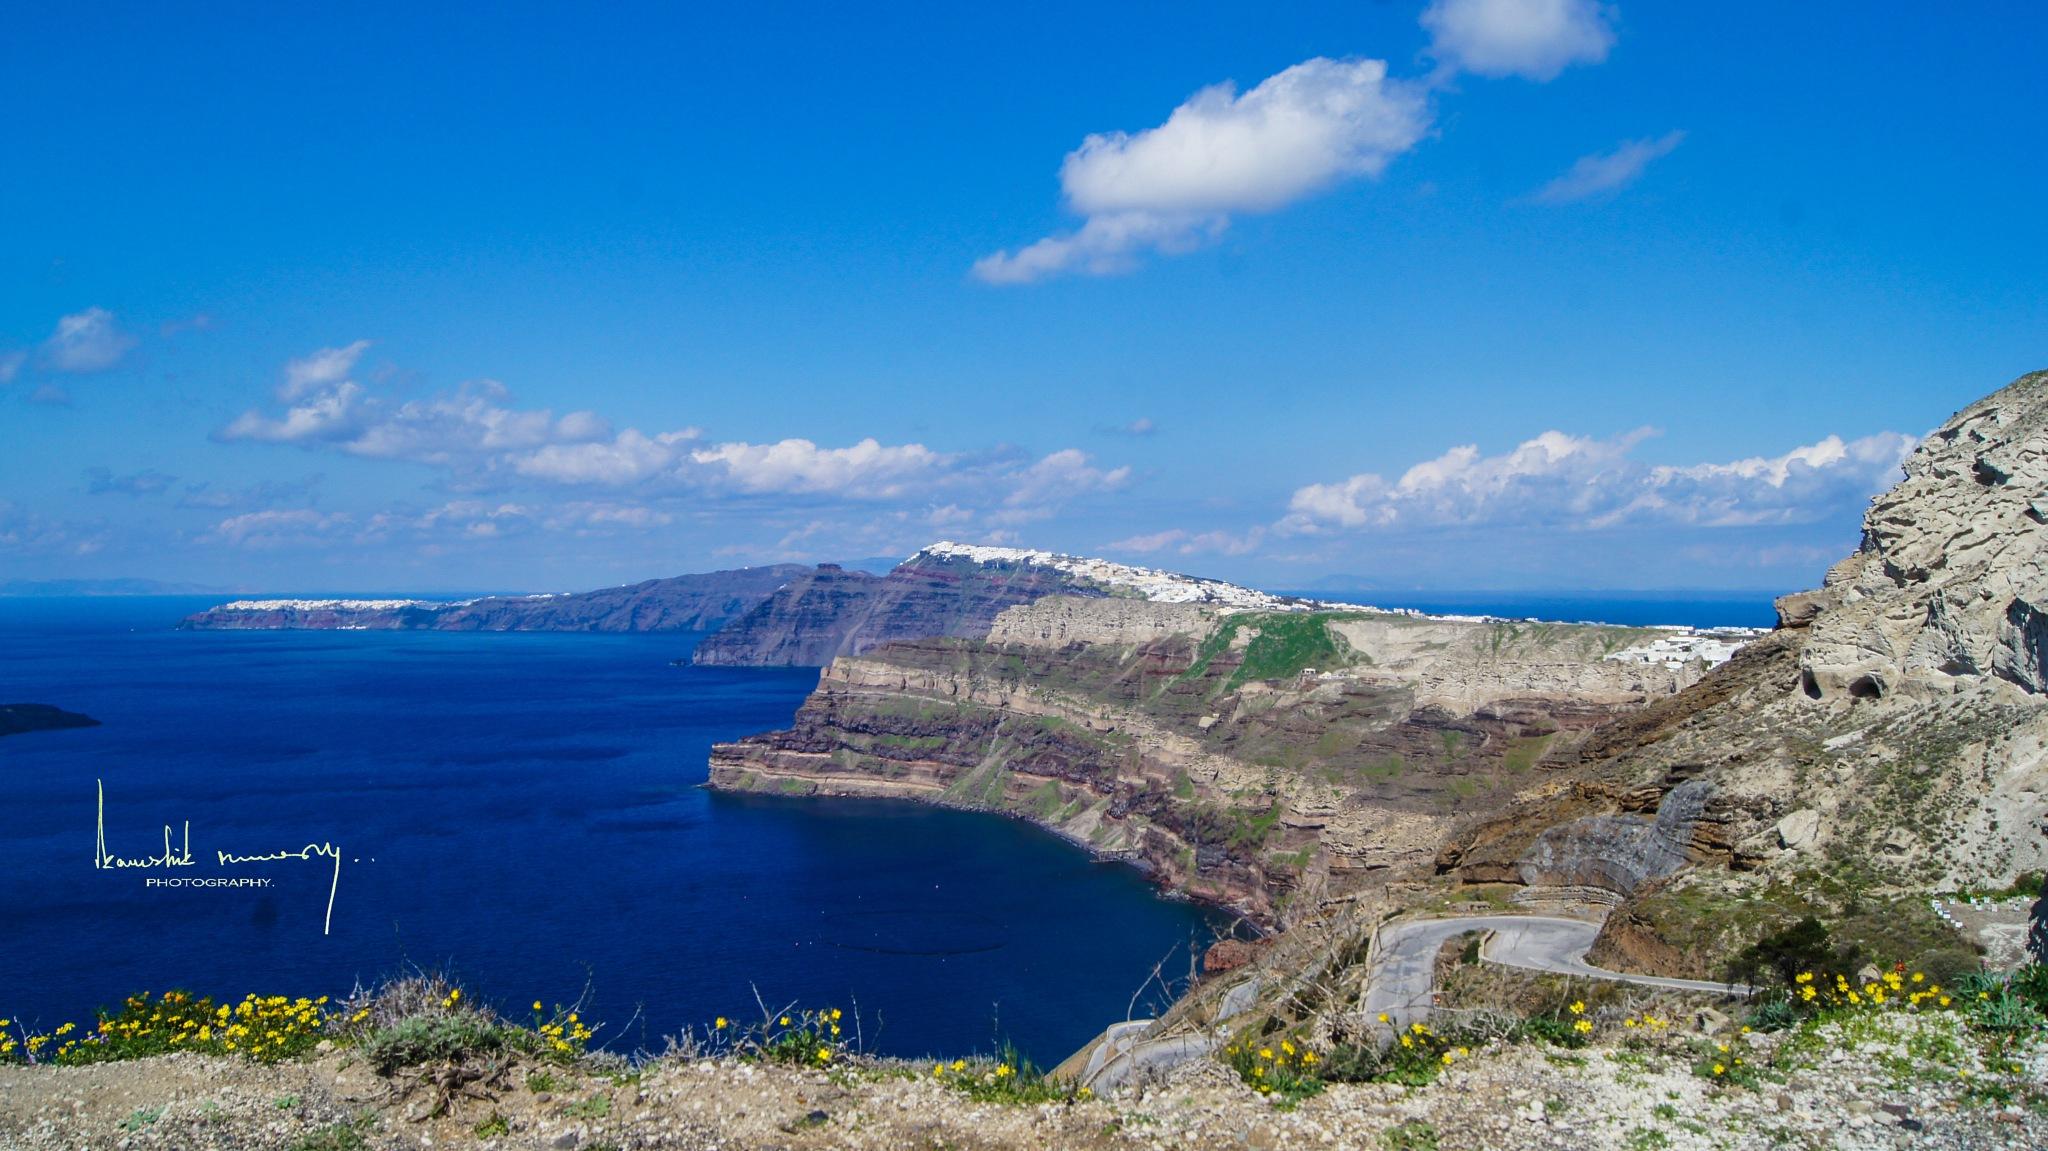 Aegean Beauty by Kaushik Nandy